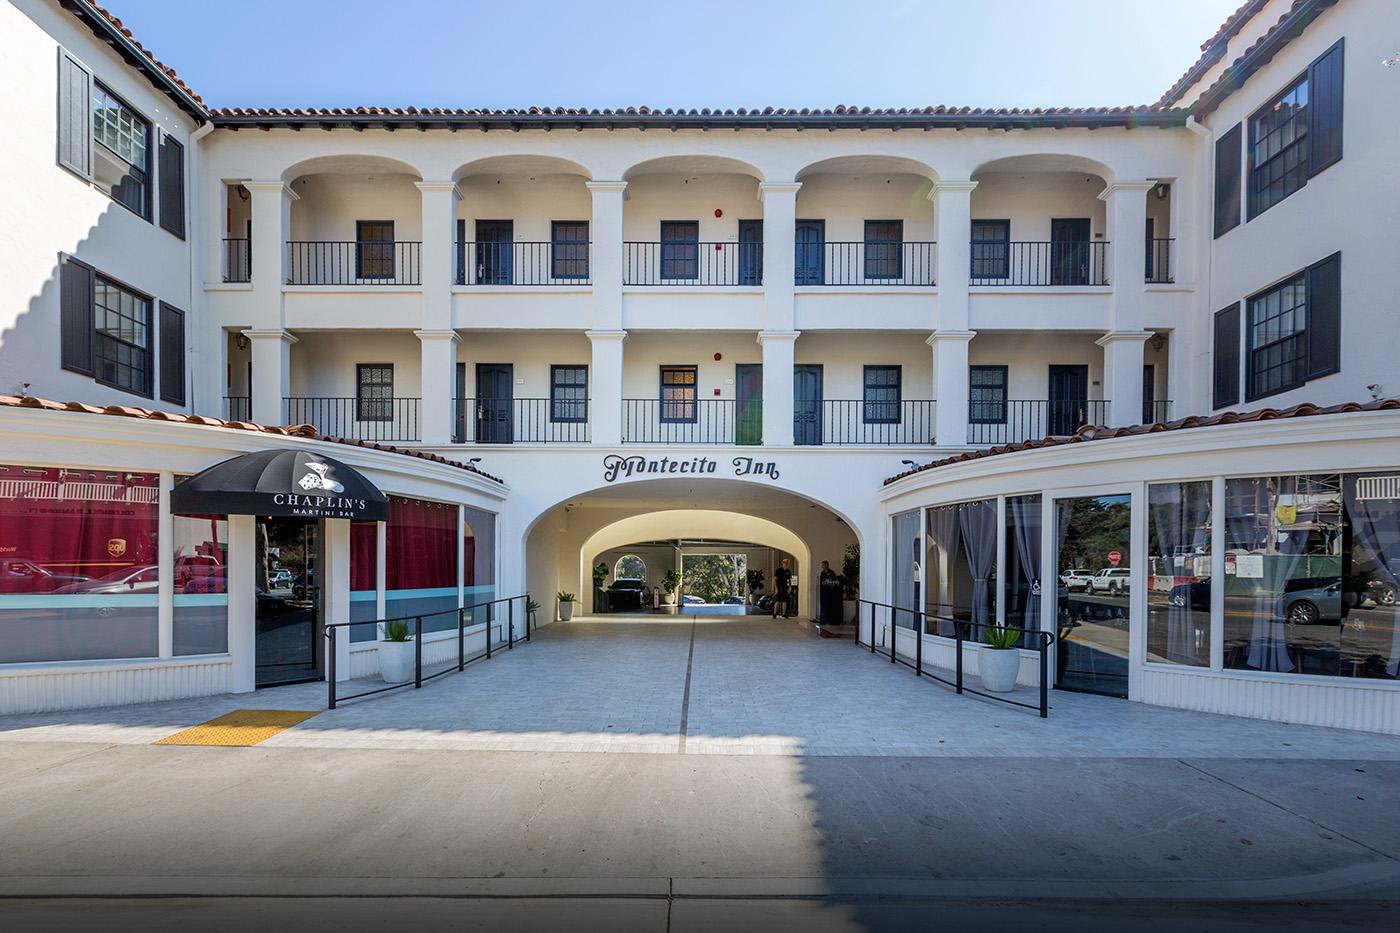 Nearby Montecito Inn